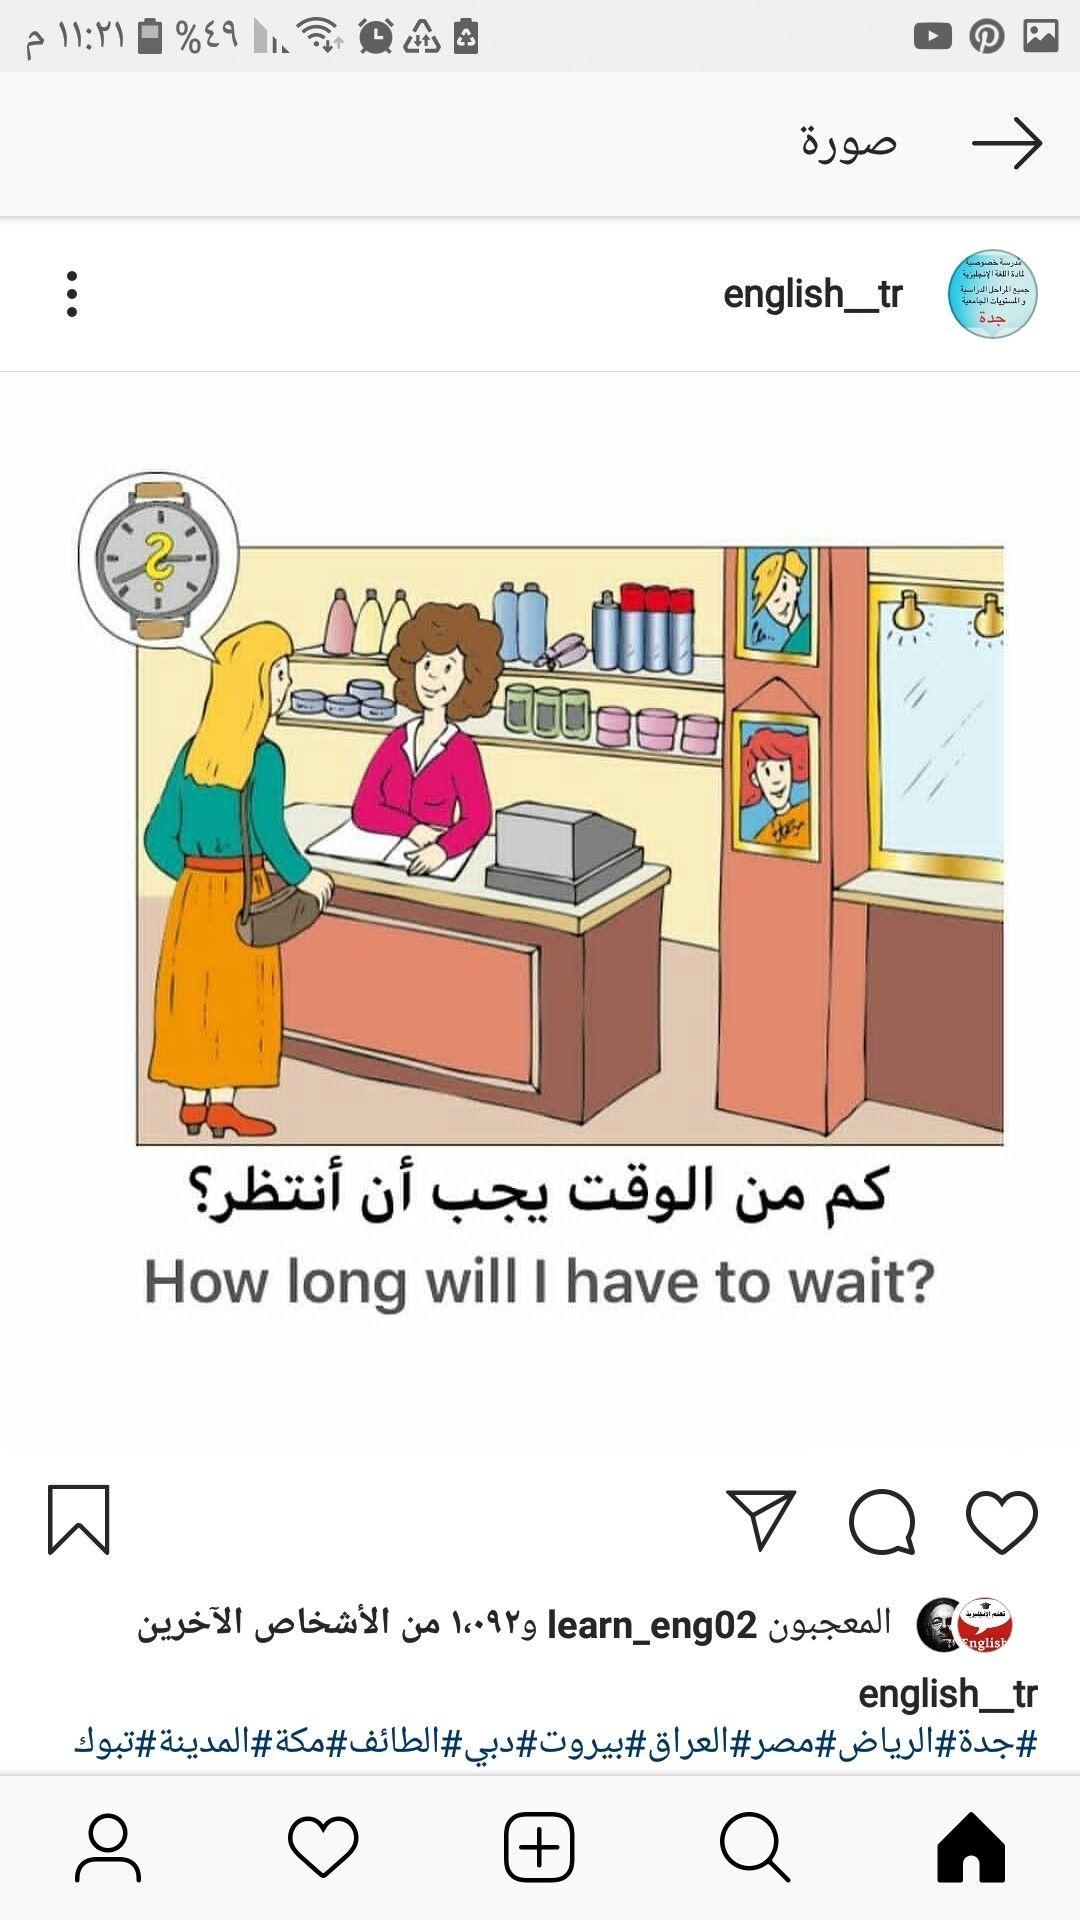 Pin By Raghad On English English Language Course English Language Learning English Language Learning Grammar